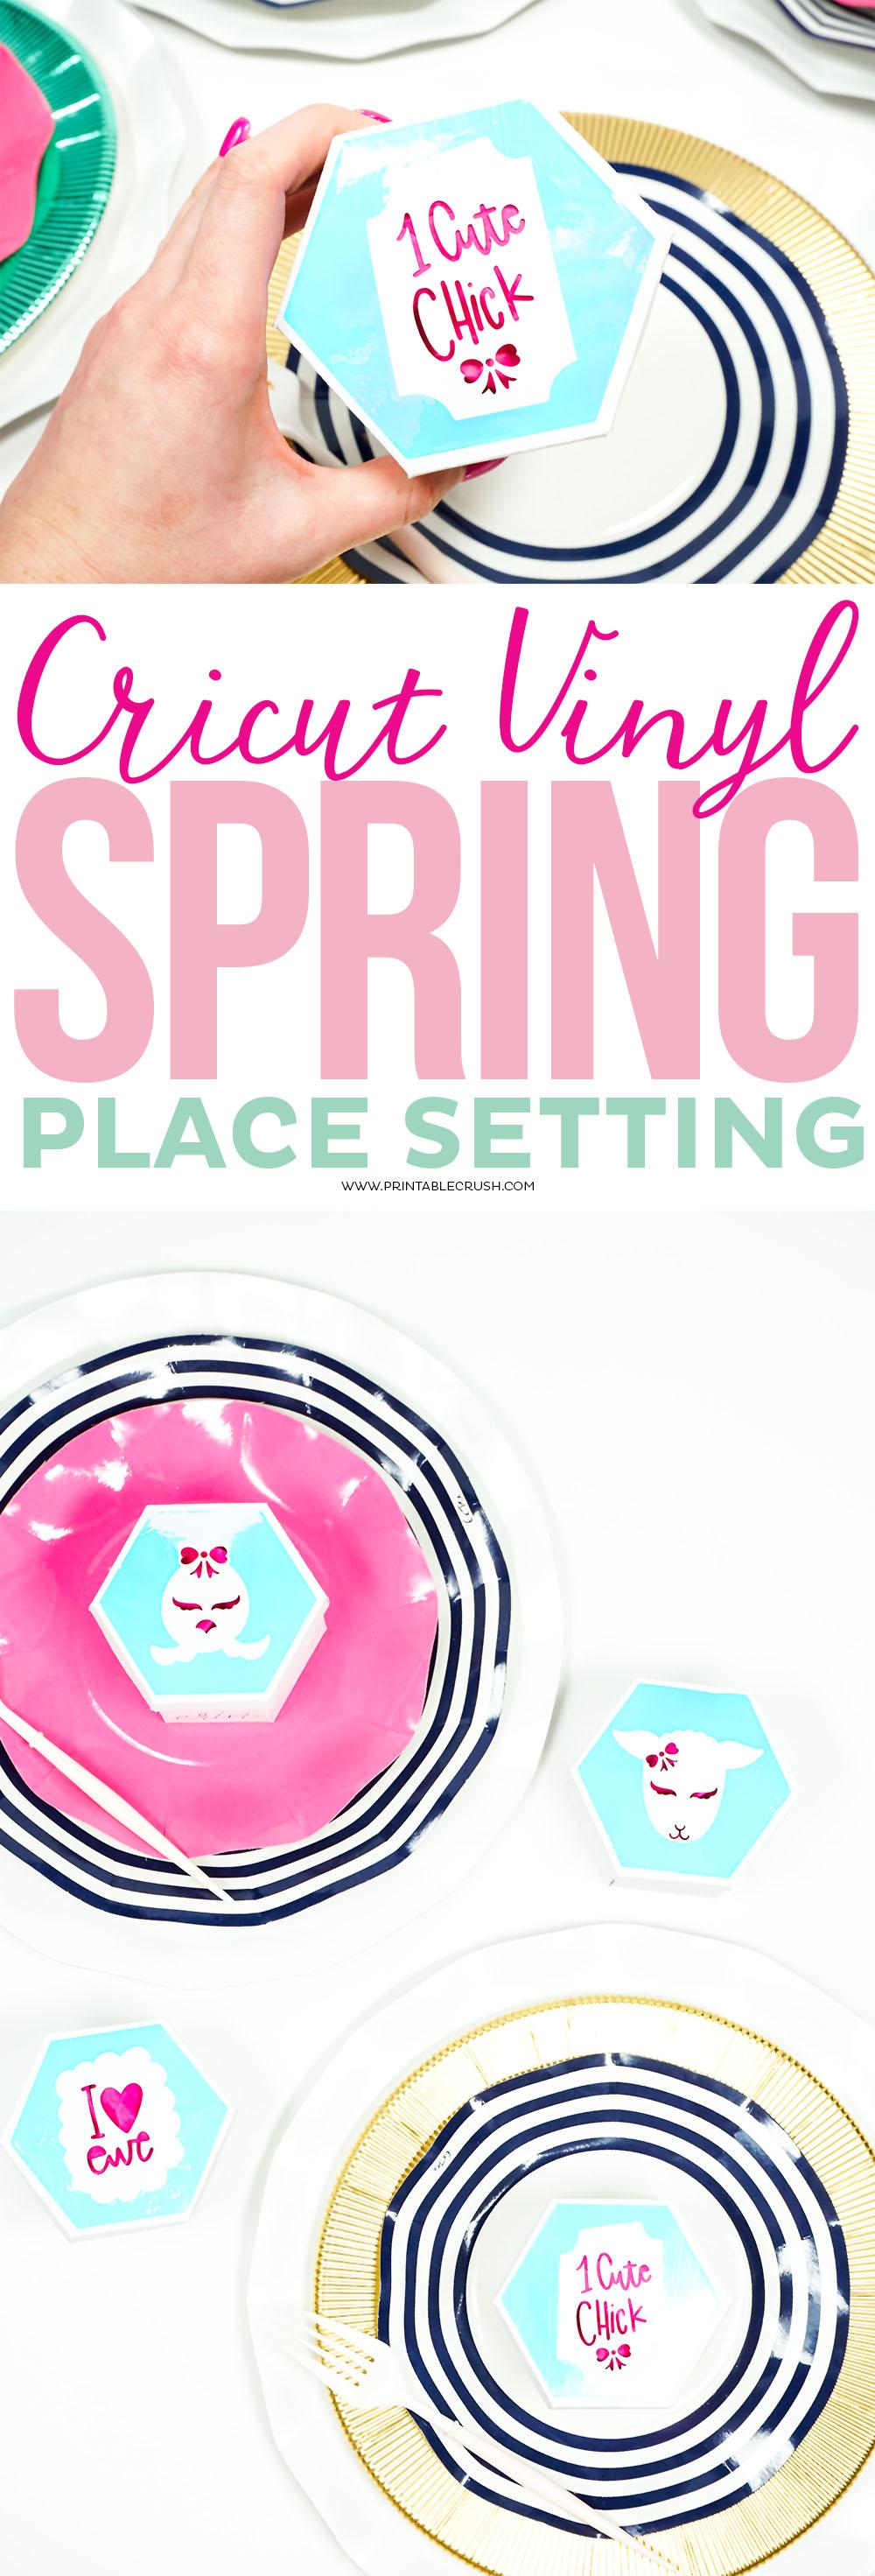 Cricut Vinyl Spring Place Setting closeup collage